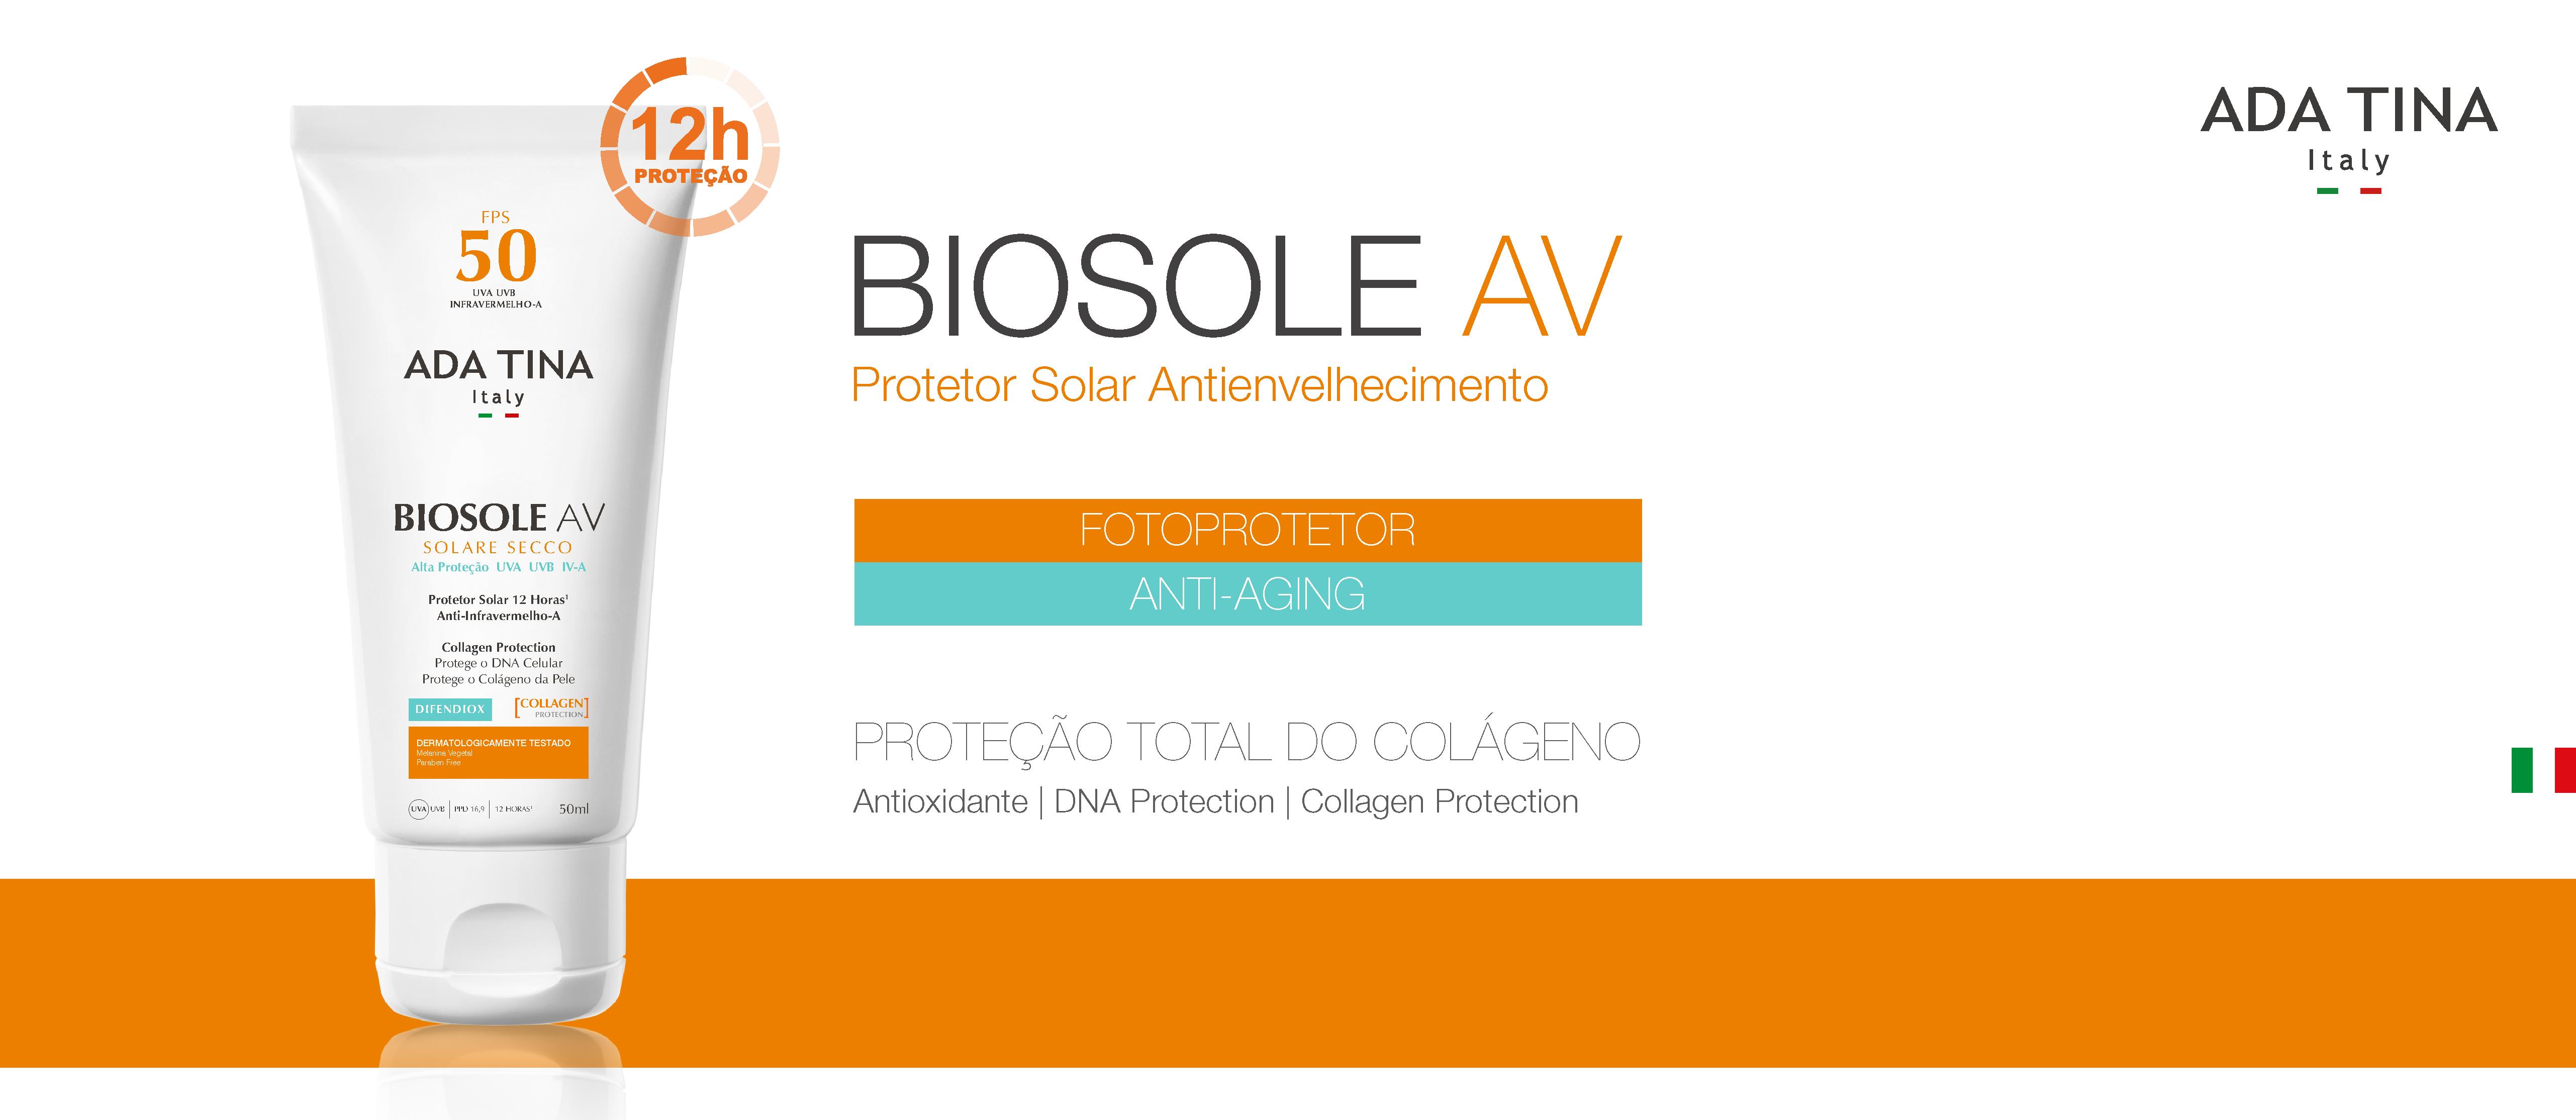 Biosole AV